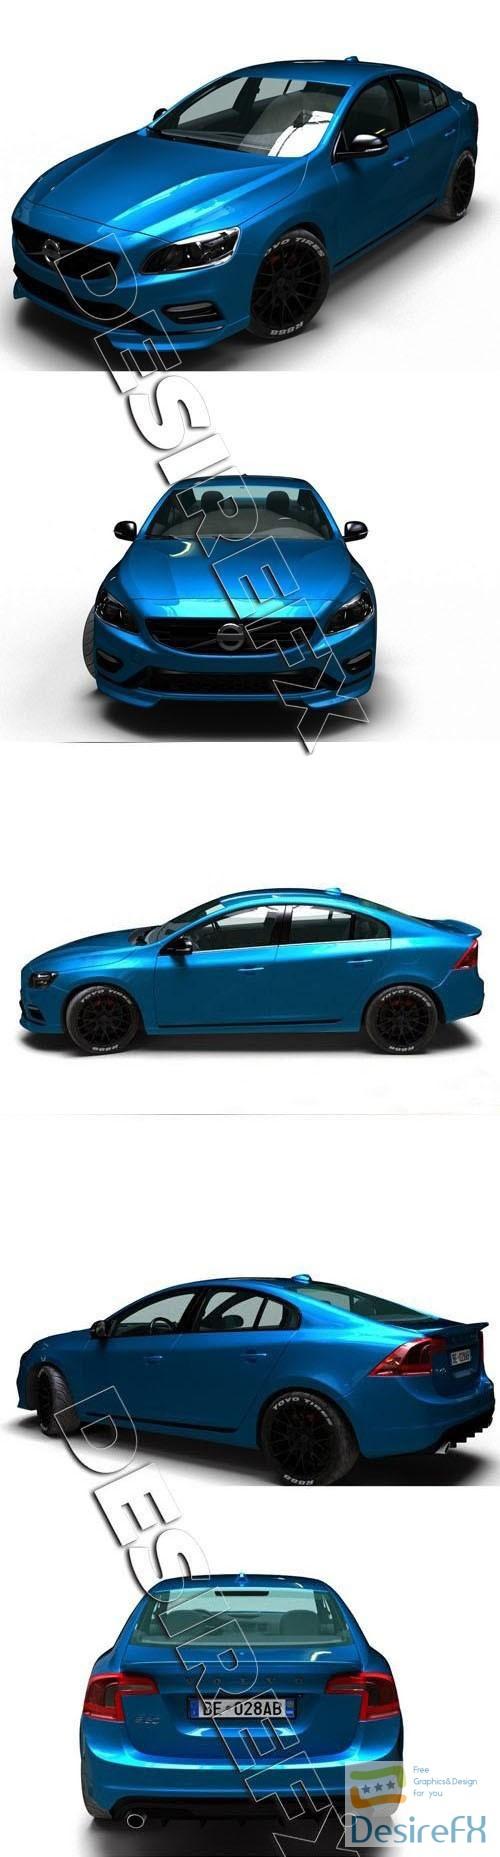 3d-models - Volvo S60 Polestar 3D Model